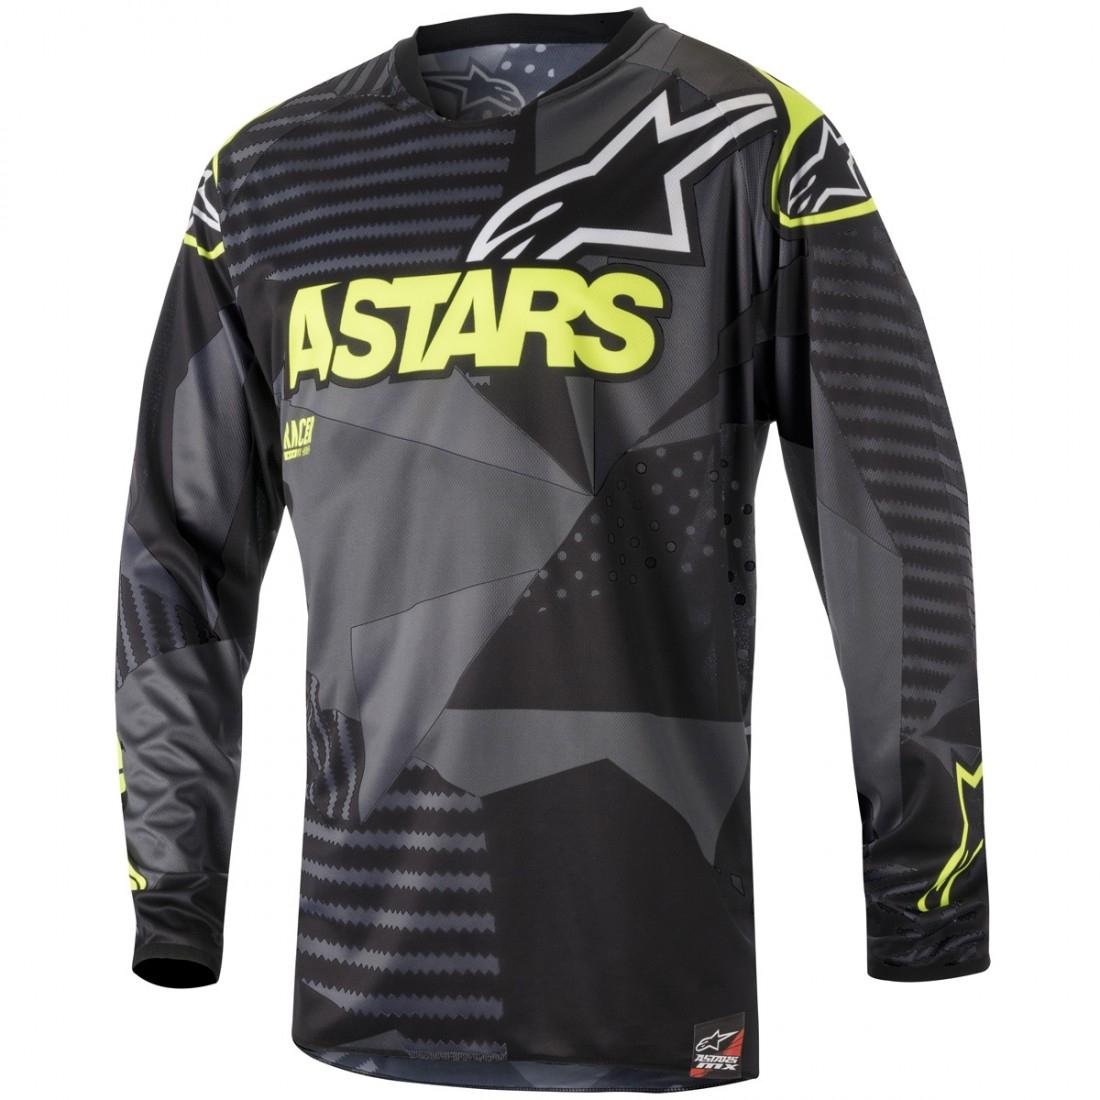 ALPINESTARS Racer 2018 Tactical Black / Yellow Fluo Jersey